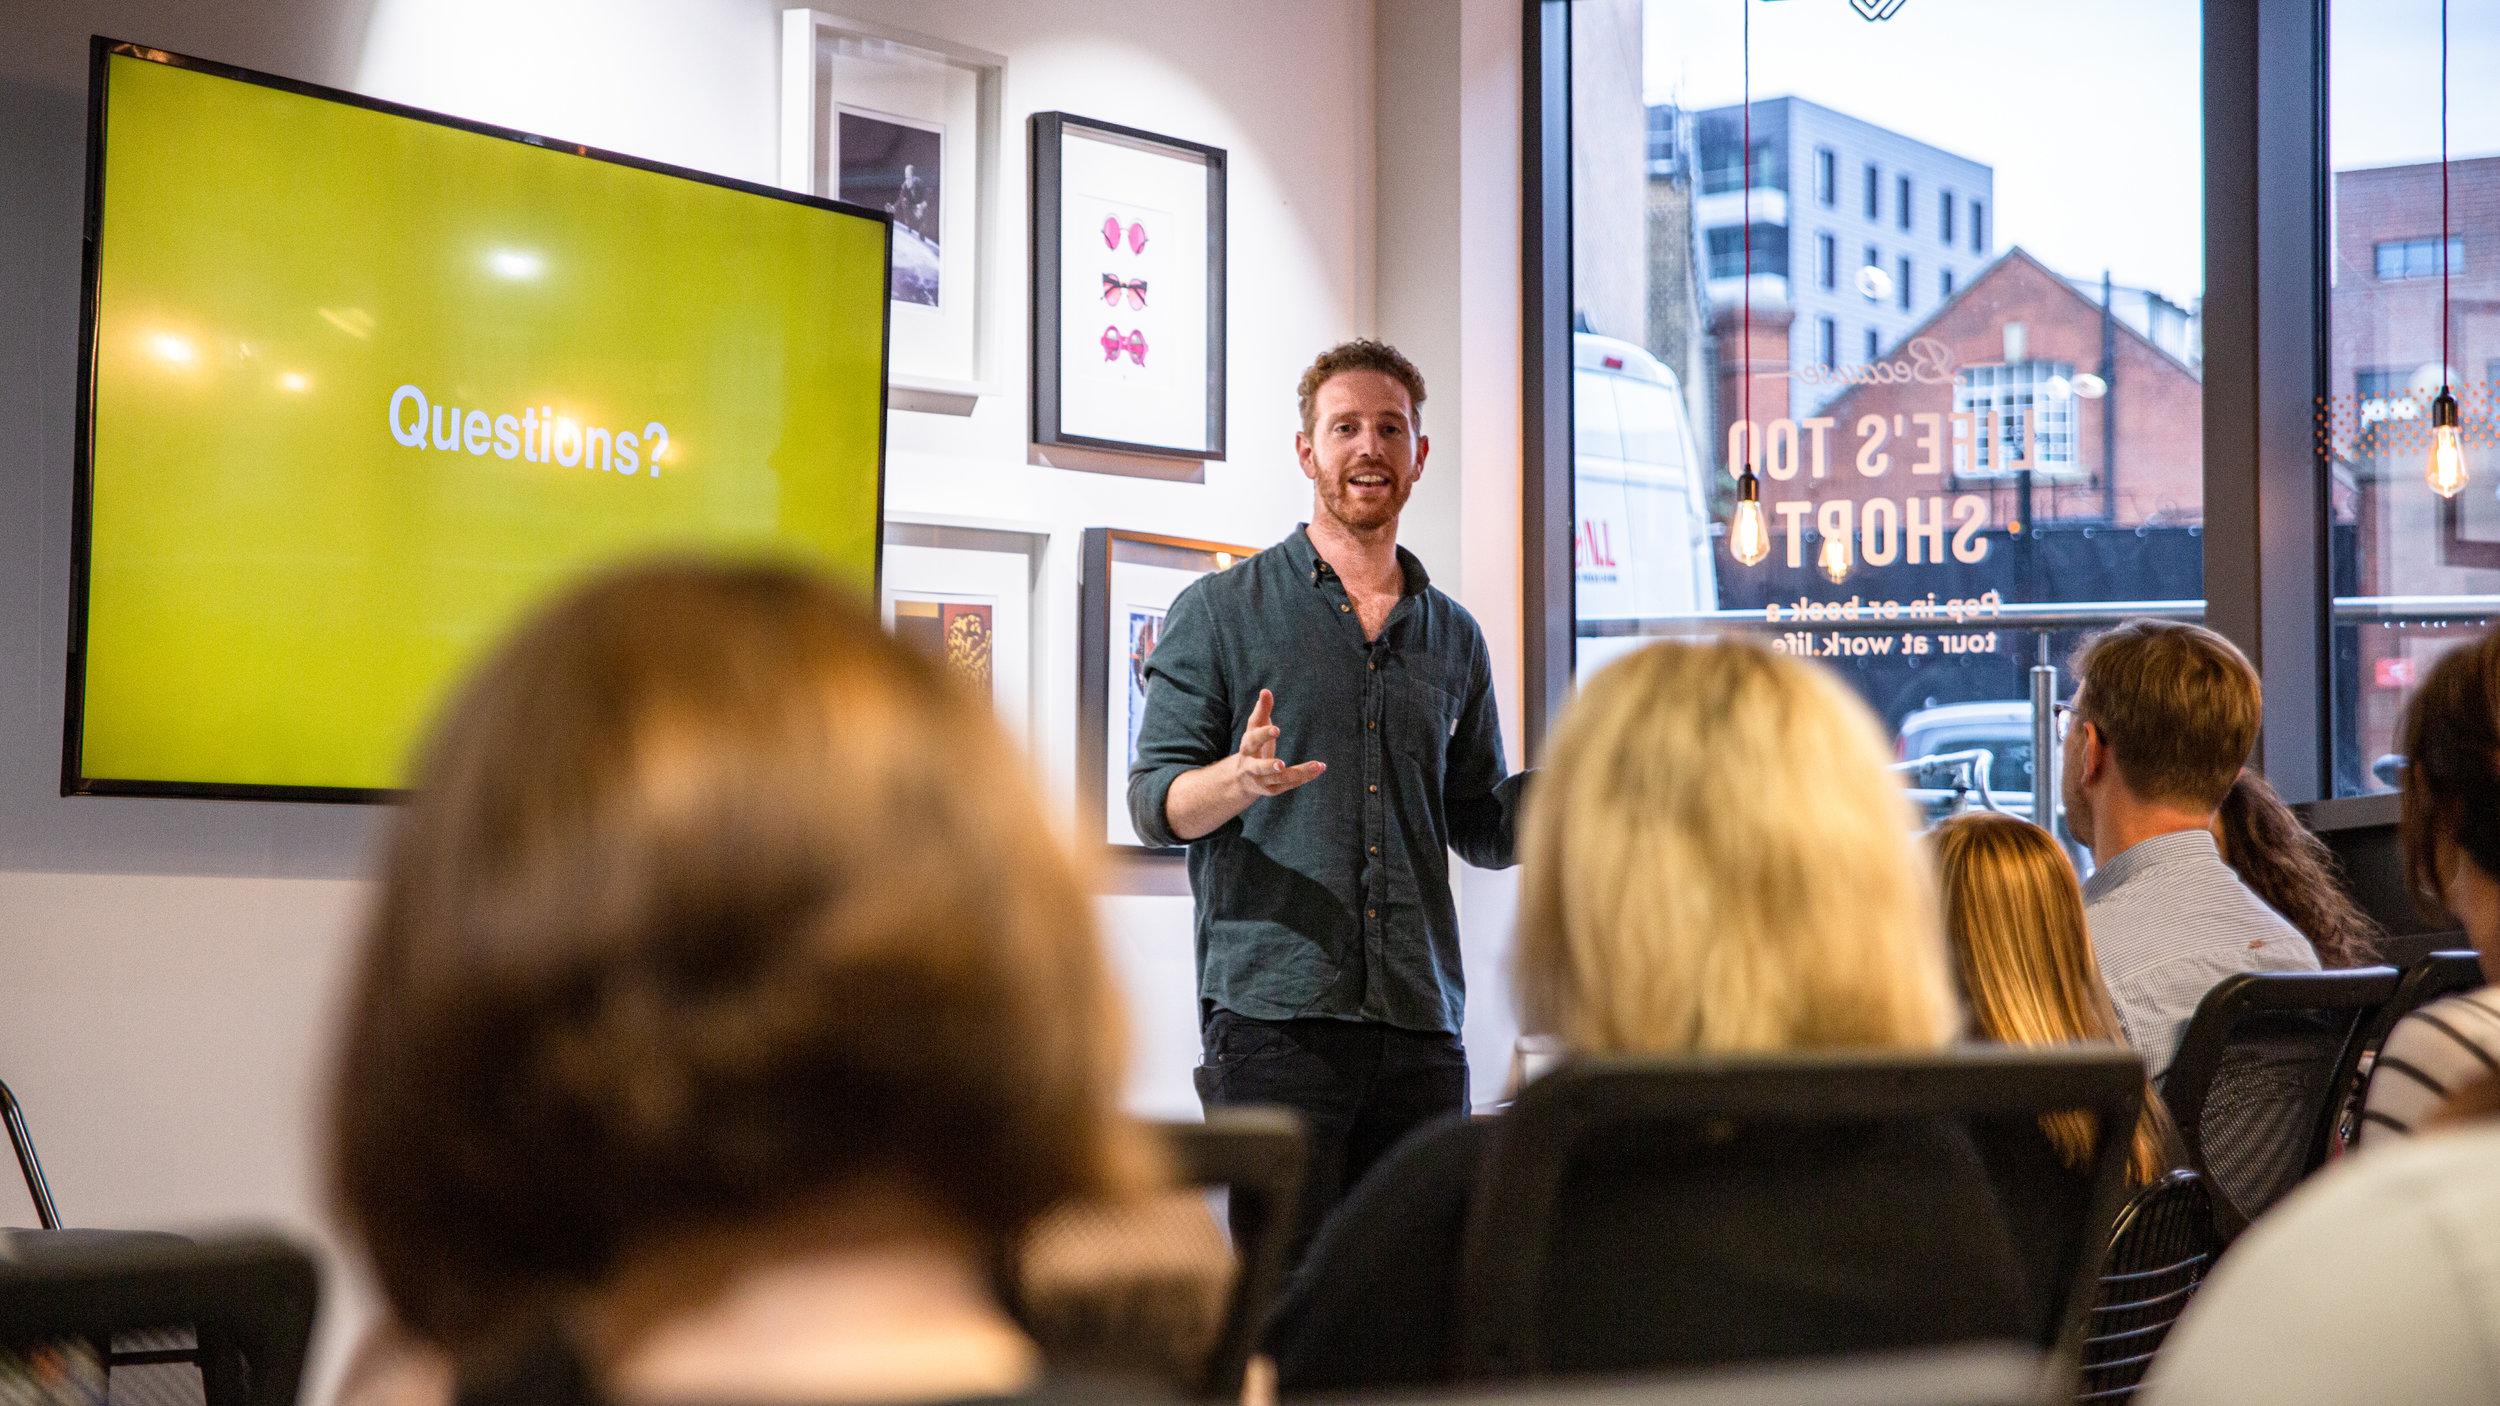 Josh Fineman, Mattr Media Co-Founder rounding up the night